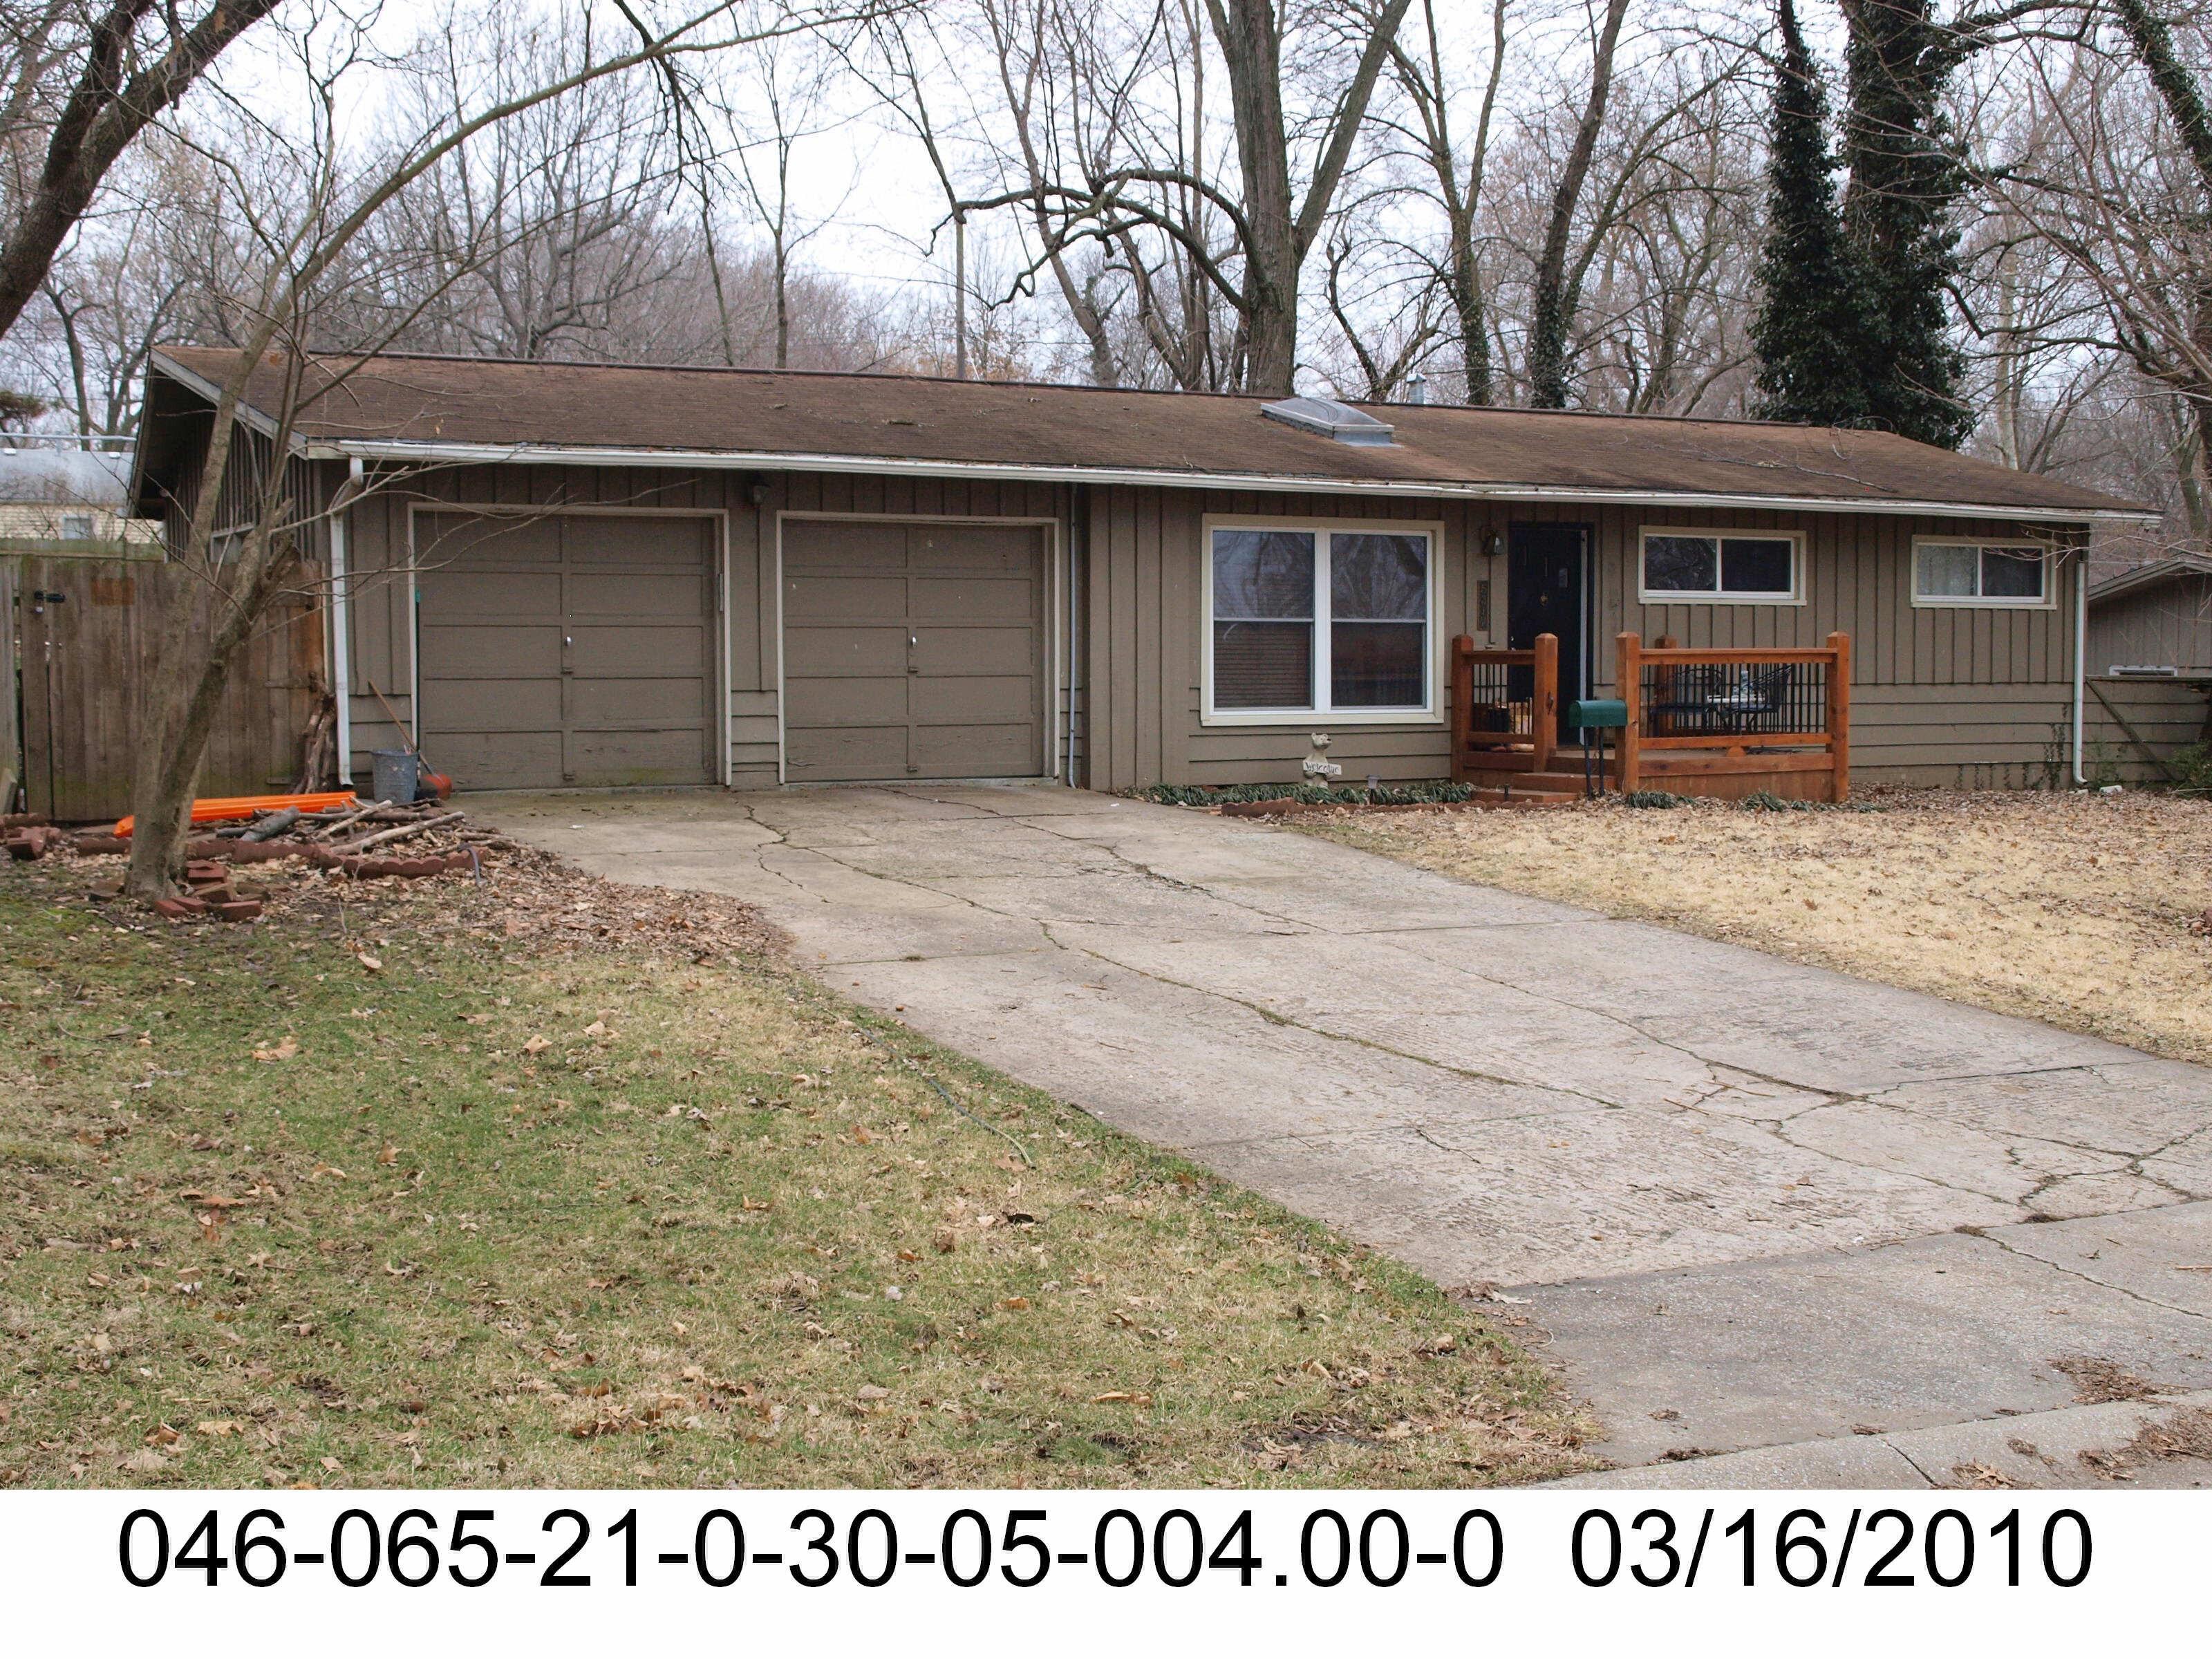 Kansas johnson county prairie village -  85 000 Property In Prairie Village Kansas